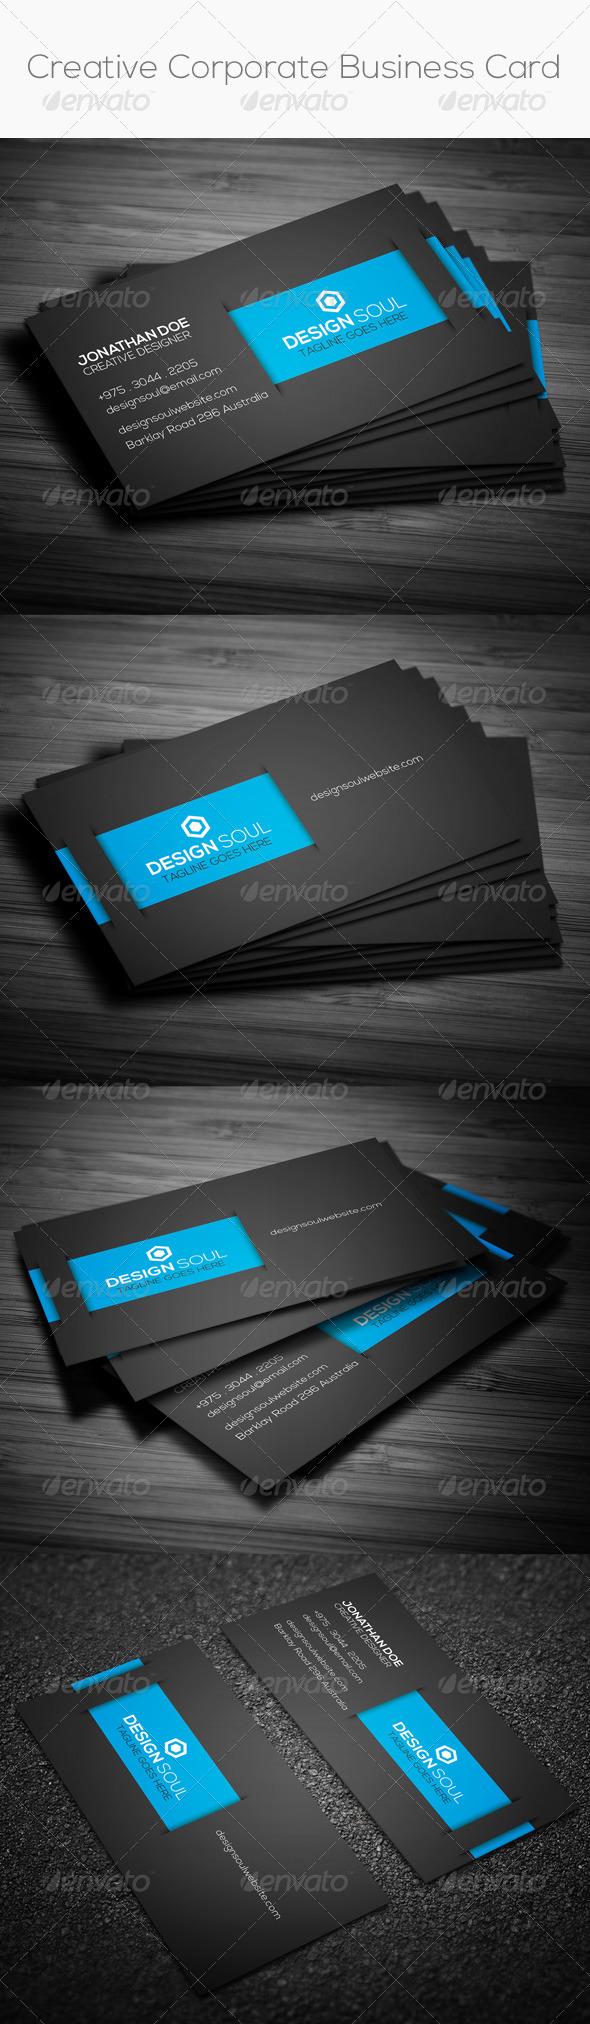 GraphicRiver Creative Corporate Business Card 8331072